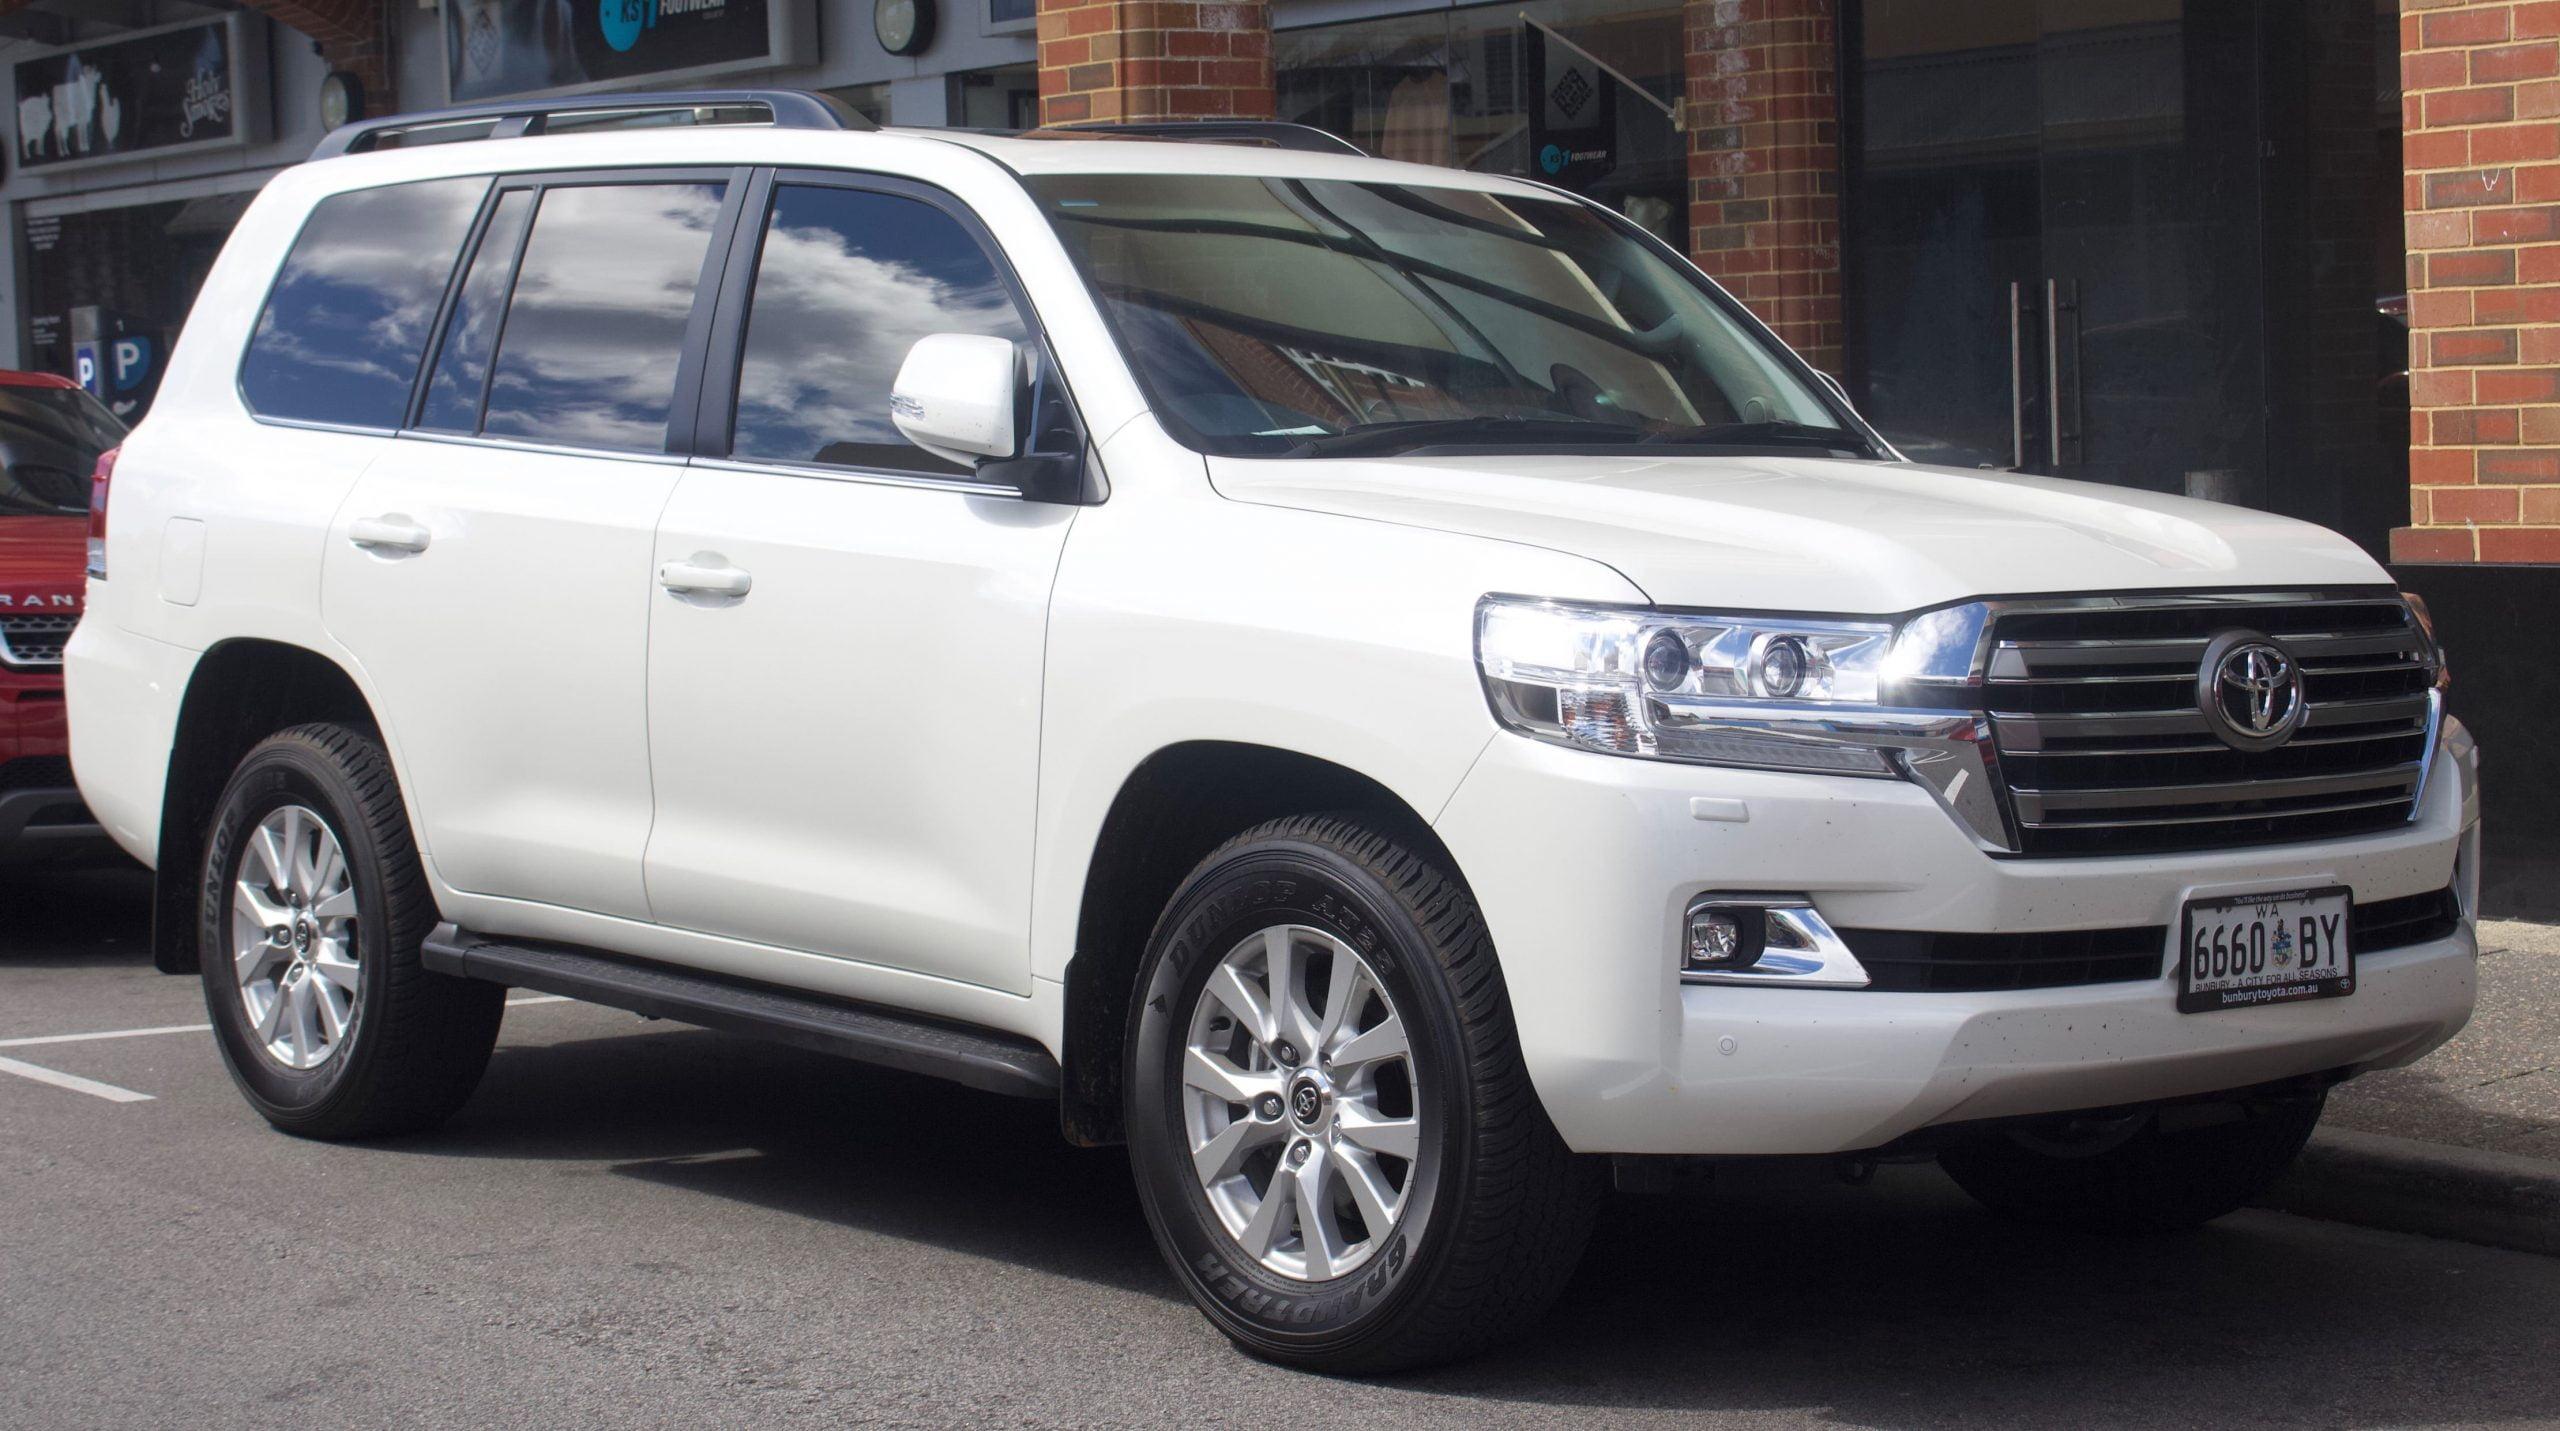 Kekurangan Harga Toyota Land Cruiser Perbandingan Harga